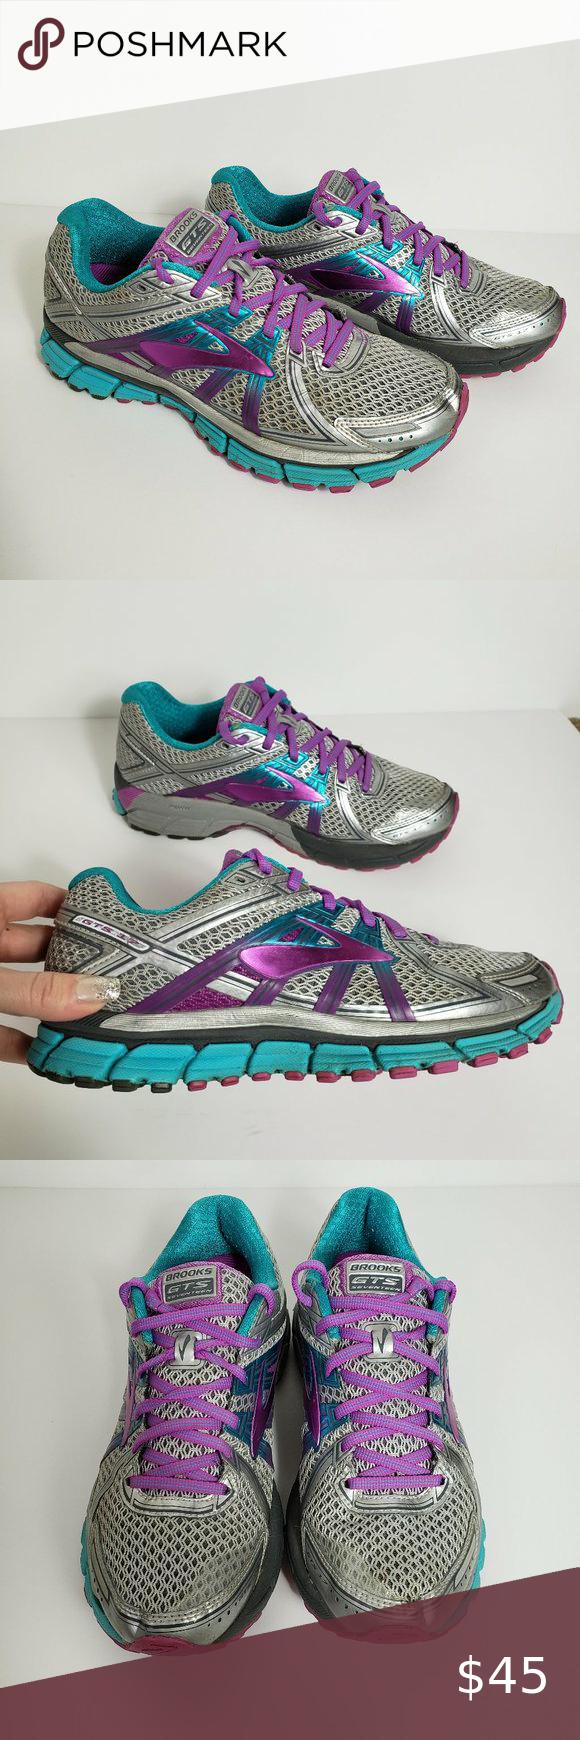 Brooks Adrenaline Gts 17 Women S Running Shoes In 2020 With Images Womens Running Shoes Running Shoes Running Women